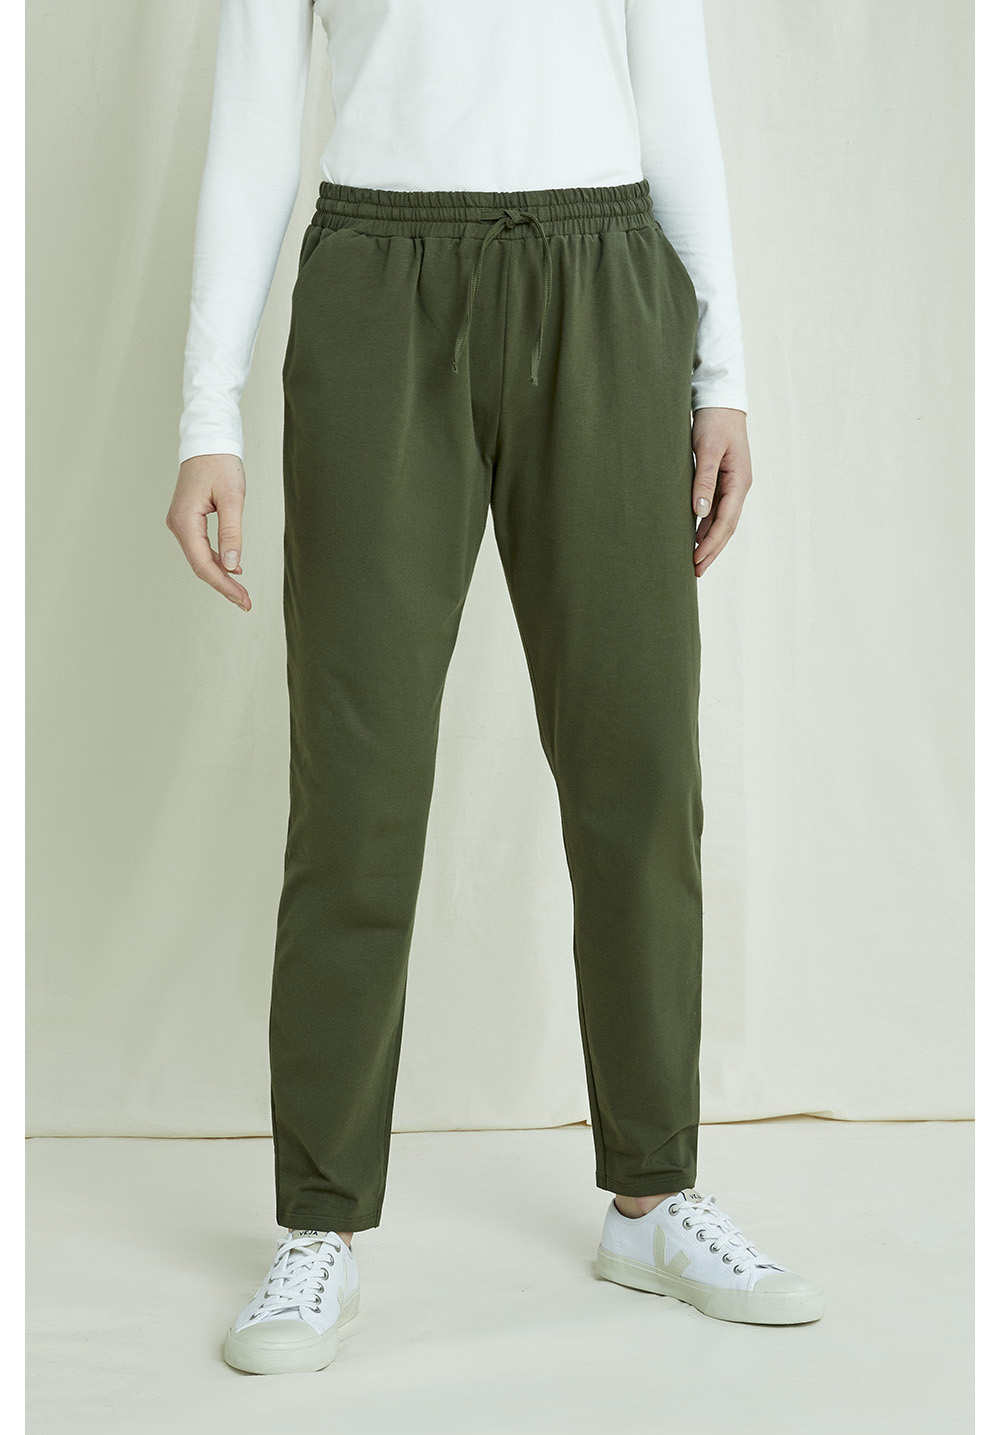 Sasha Trousers in Khaki